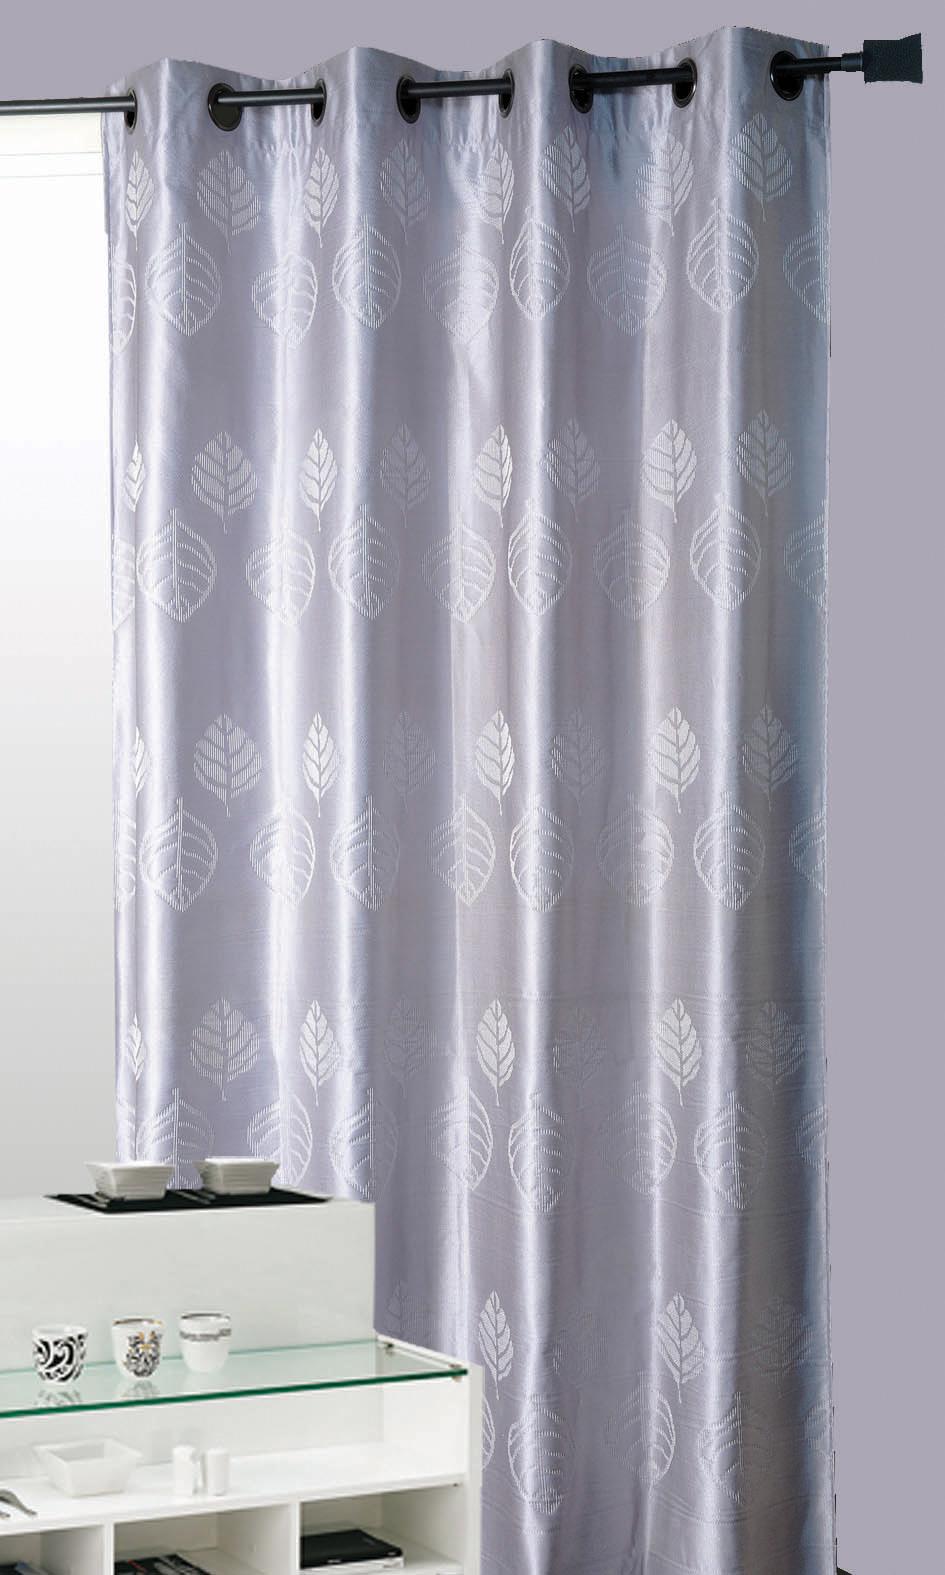 Cortina opium gris cortina casa venta en l nea de for Cortinas grises